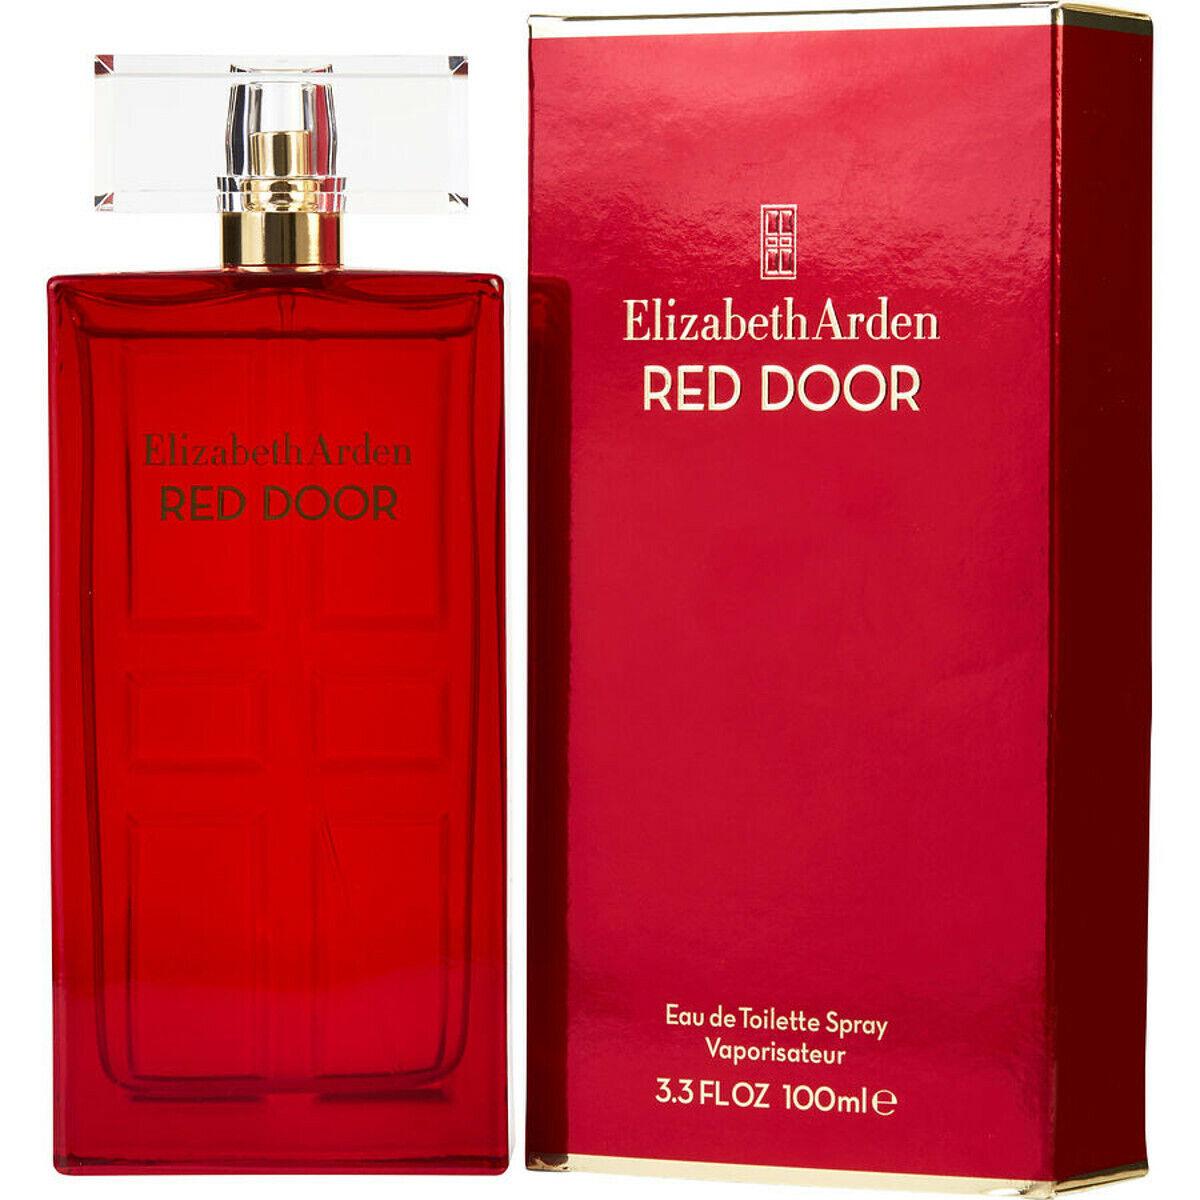 RED DOOR by Elizabeth Arden EDT Perfume Spray 3.3 oz / 3.4 oz NEW IN BOX